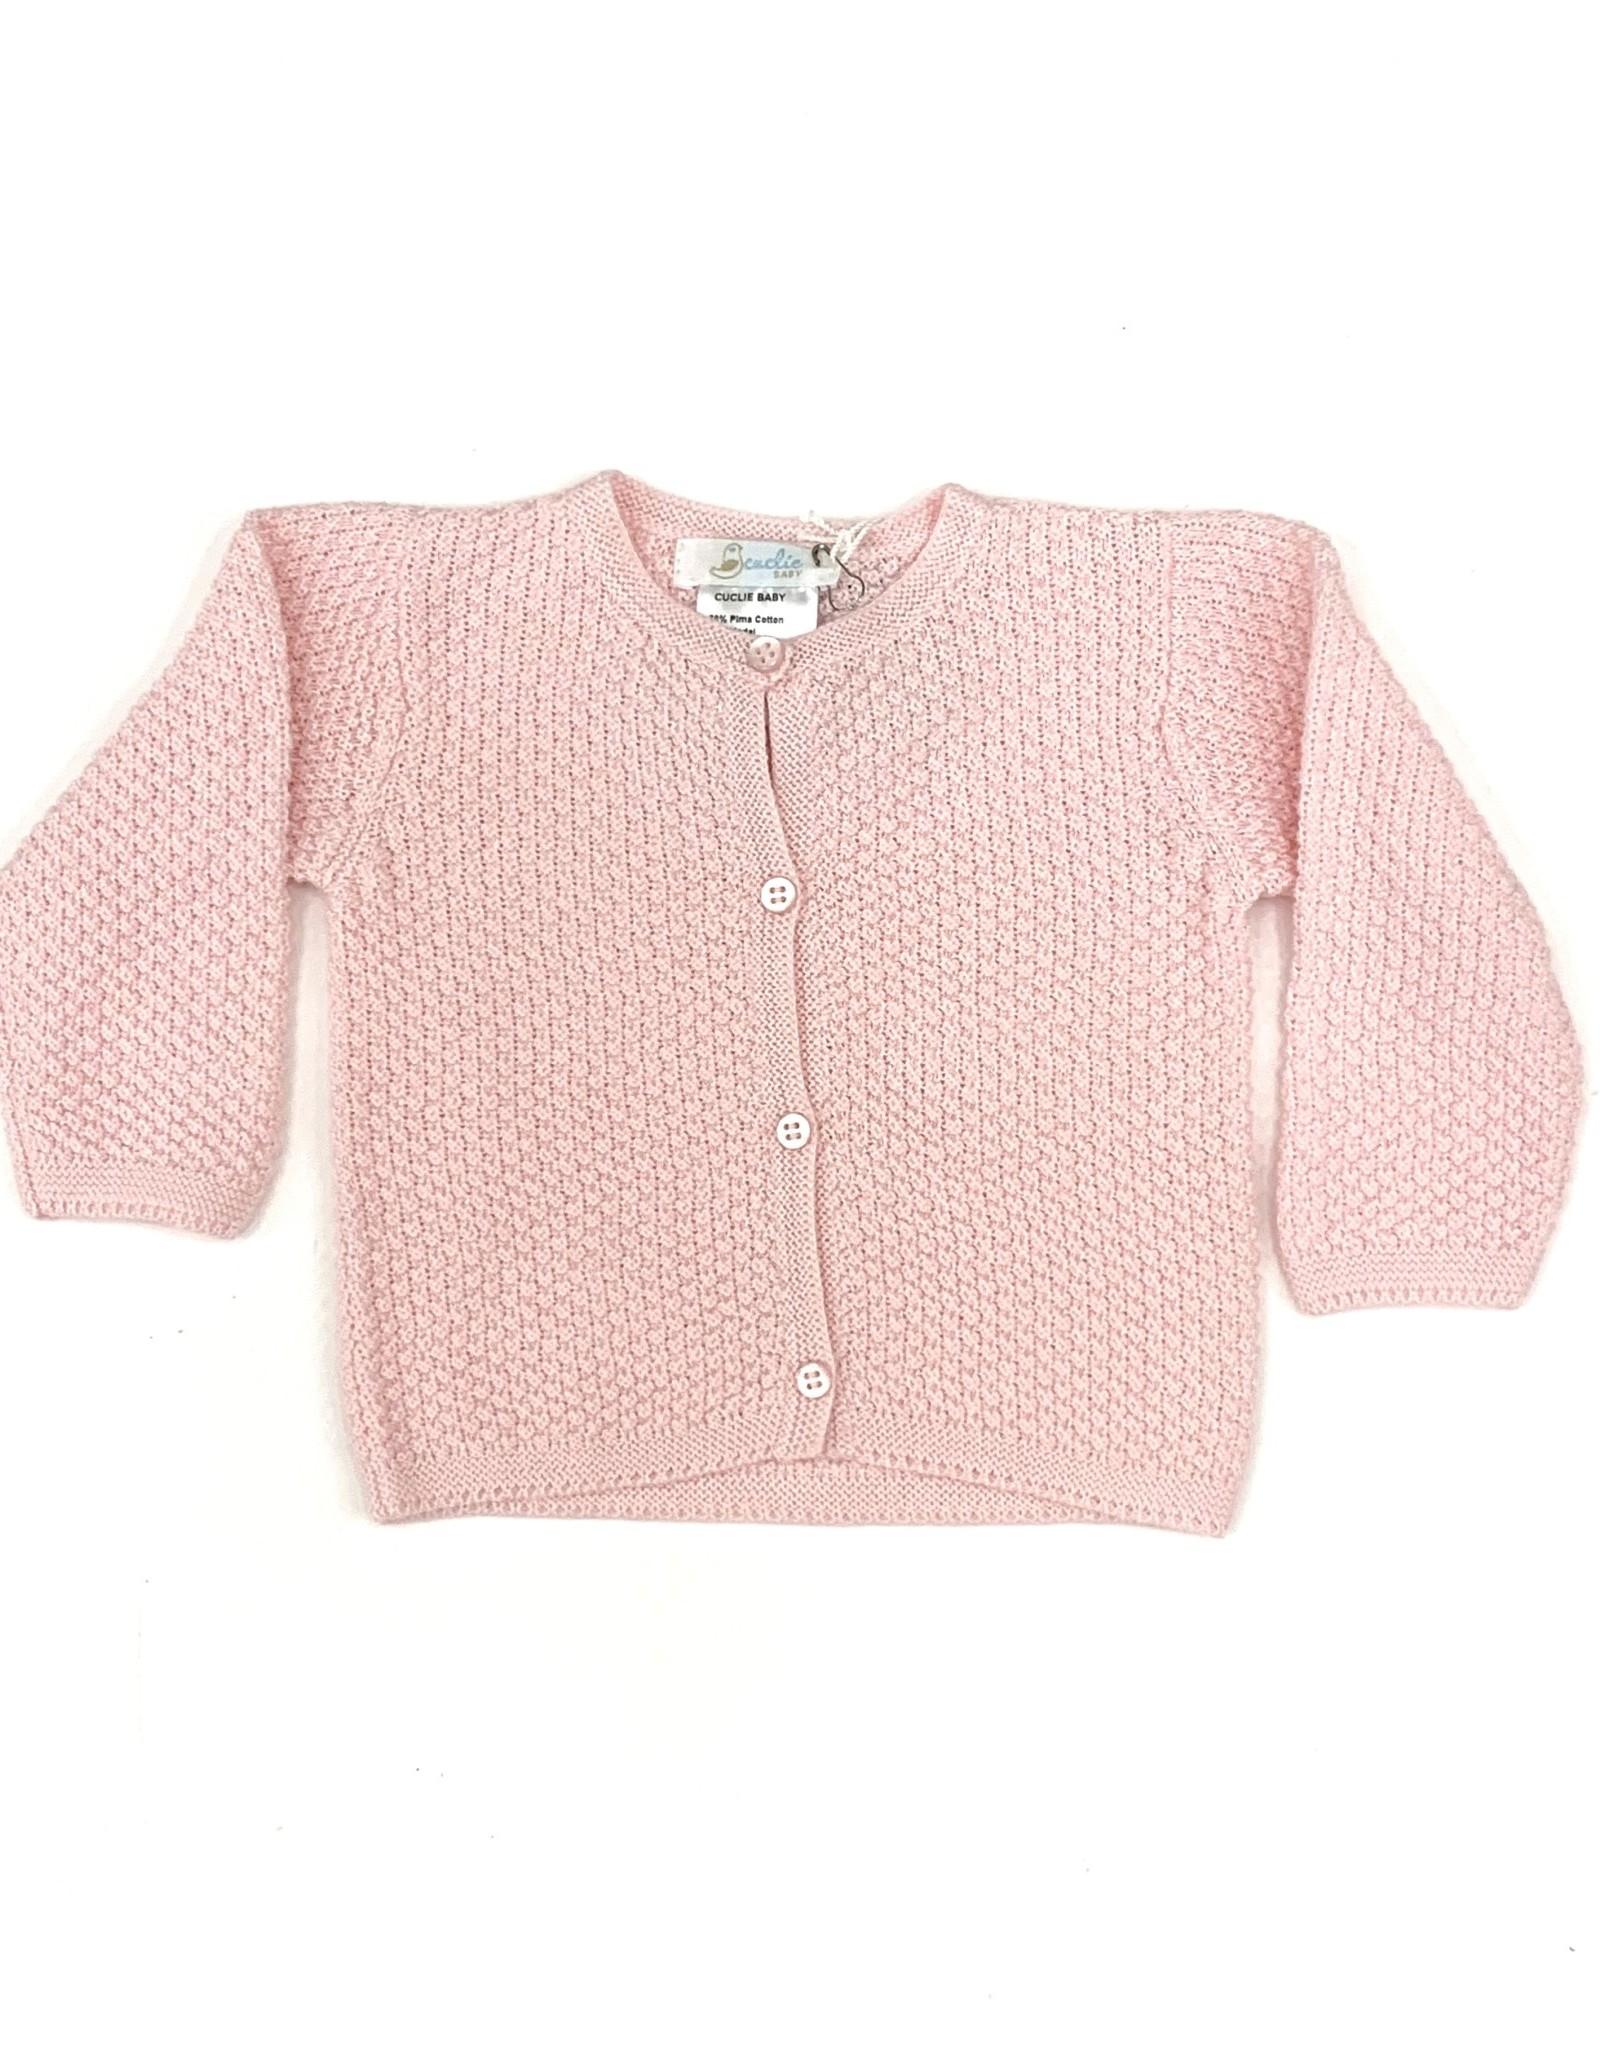 Contrast Knit Cardigan Pink